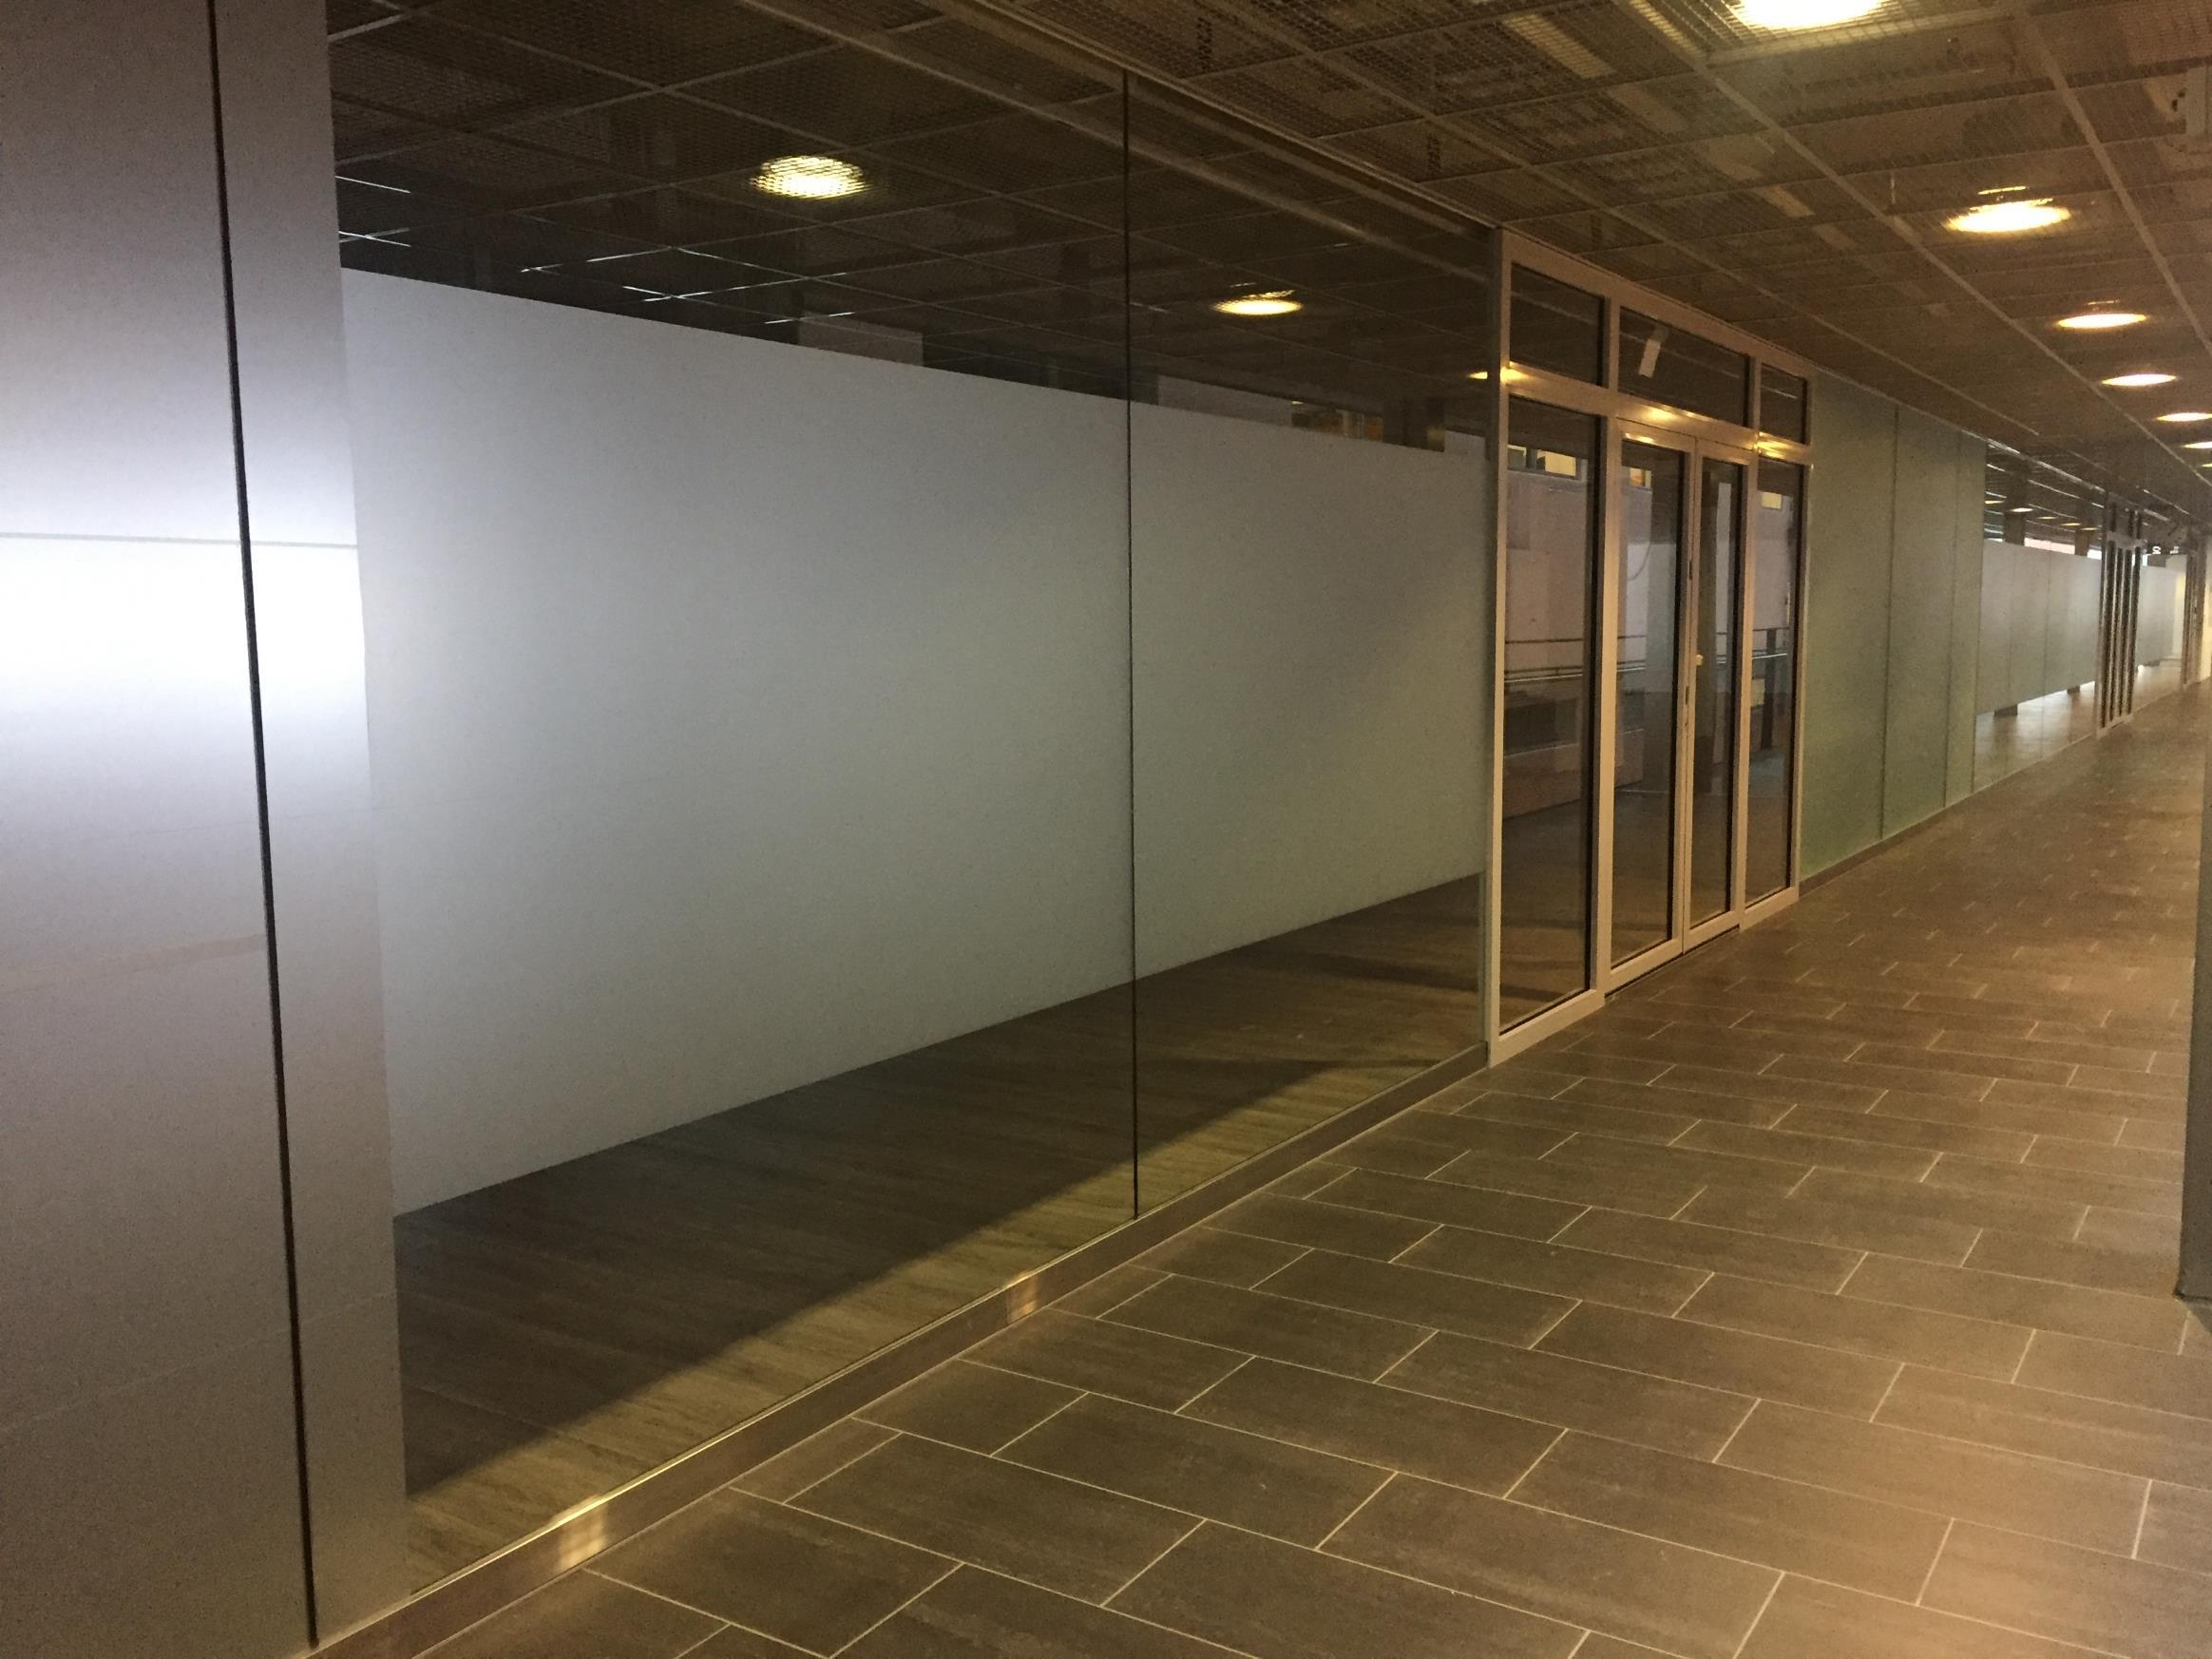 tahan_tulee_vmp-interiorin_uusi_showroom.jpg